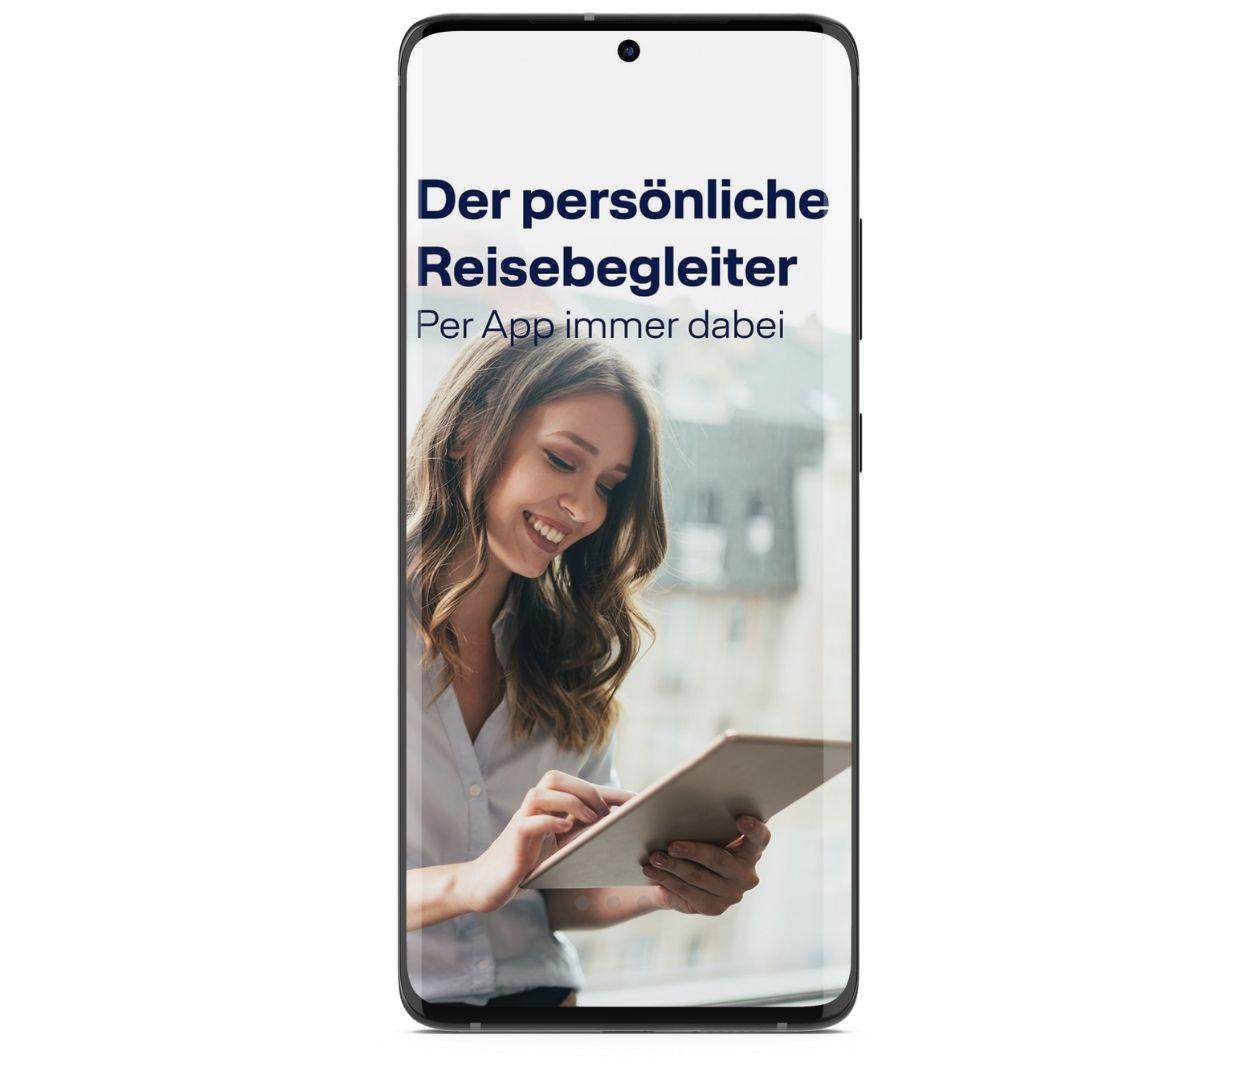 LCC App Intro Screen Reisebegleiter